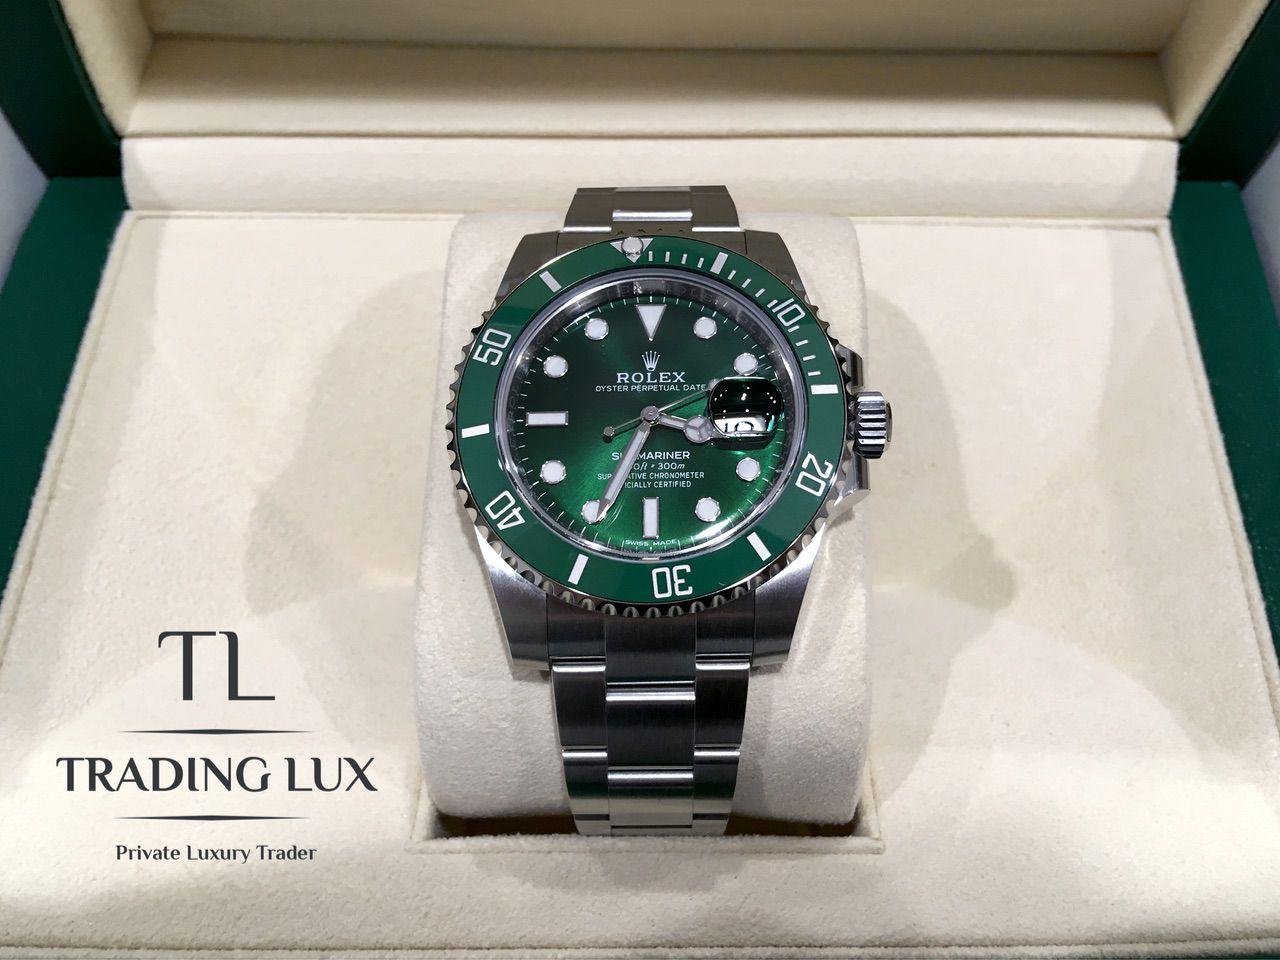 Rolex-116610LV-Hulk-6